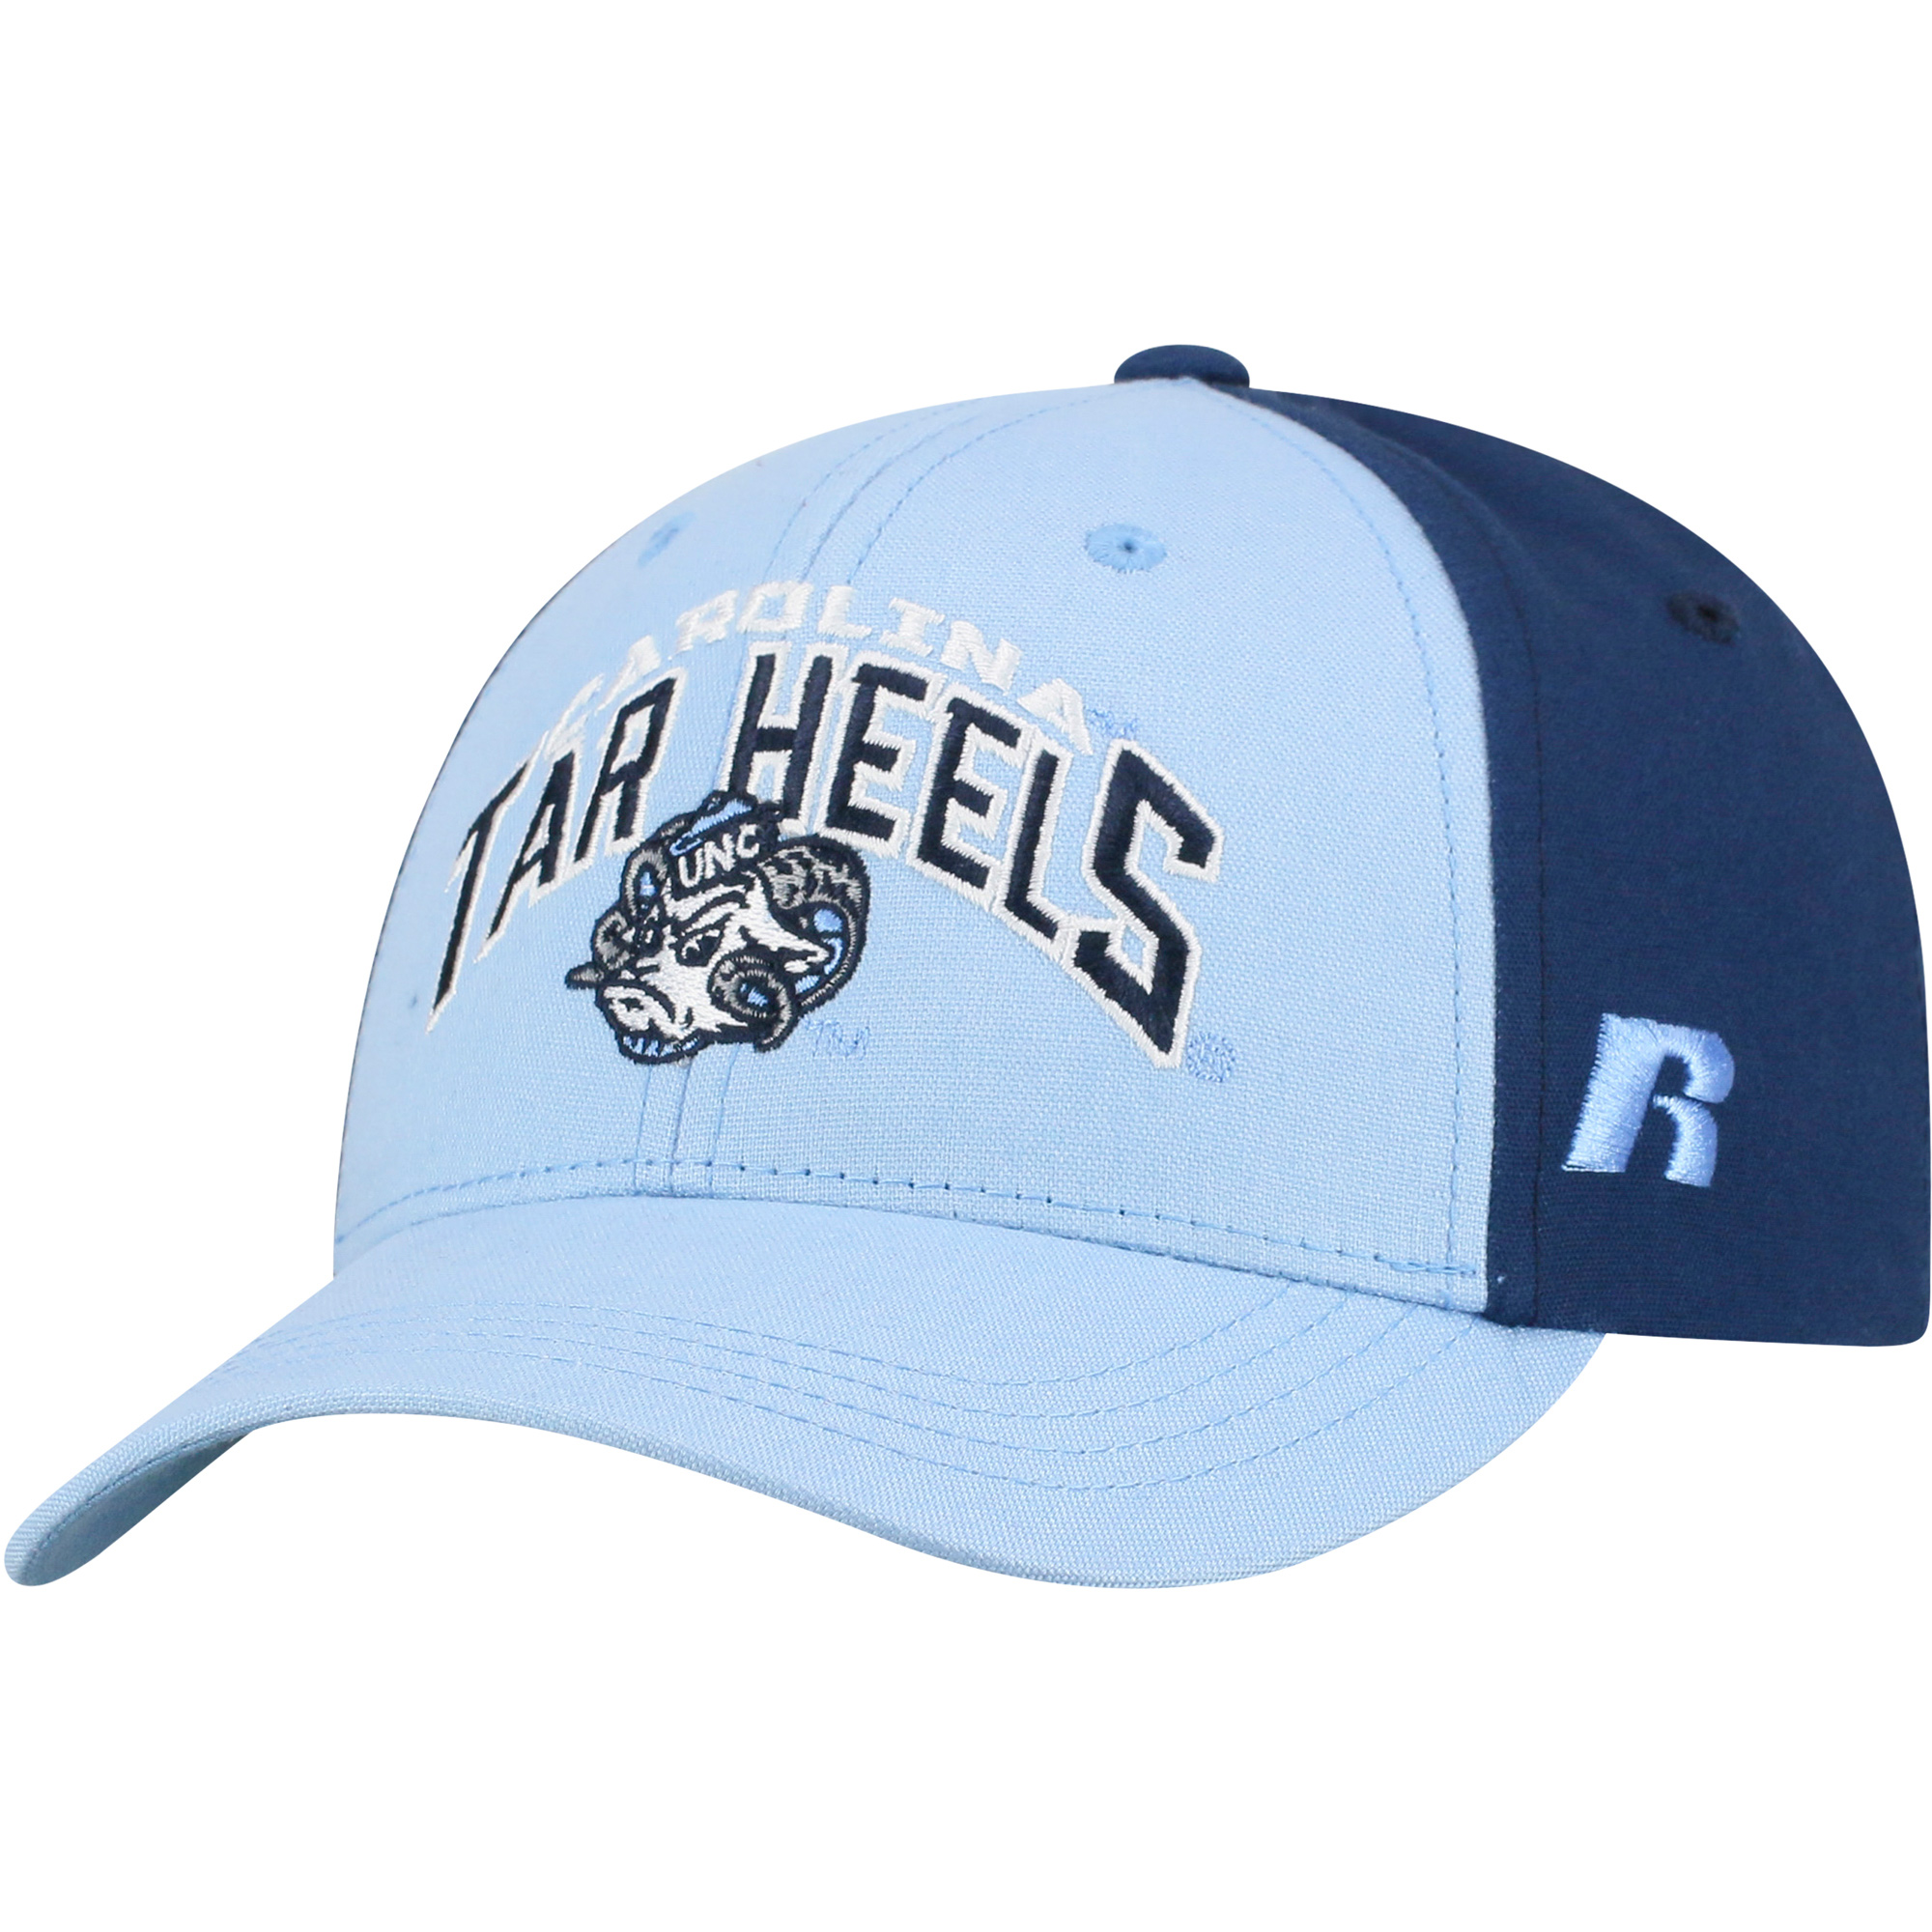 Youth Russell Carolina Blue/Navy North Carolina Tar Heels Tastic Adjustable Hat - OSFA